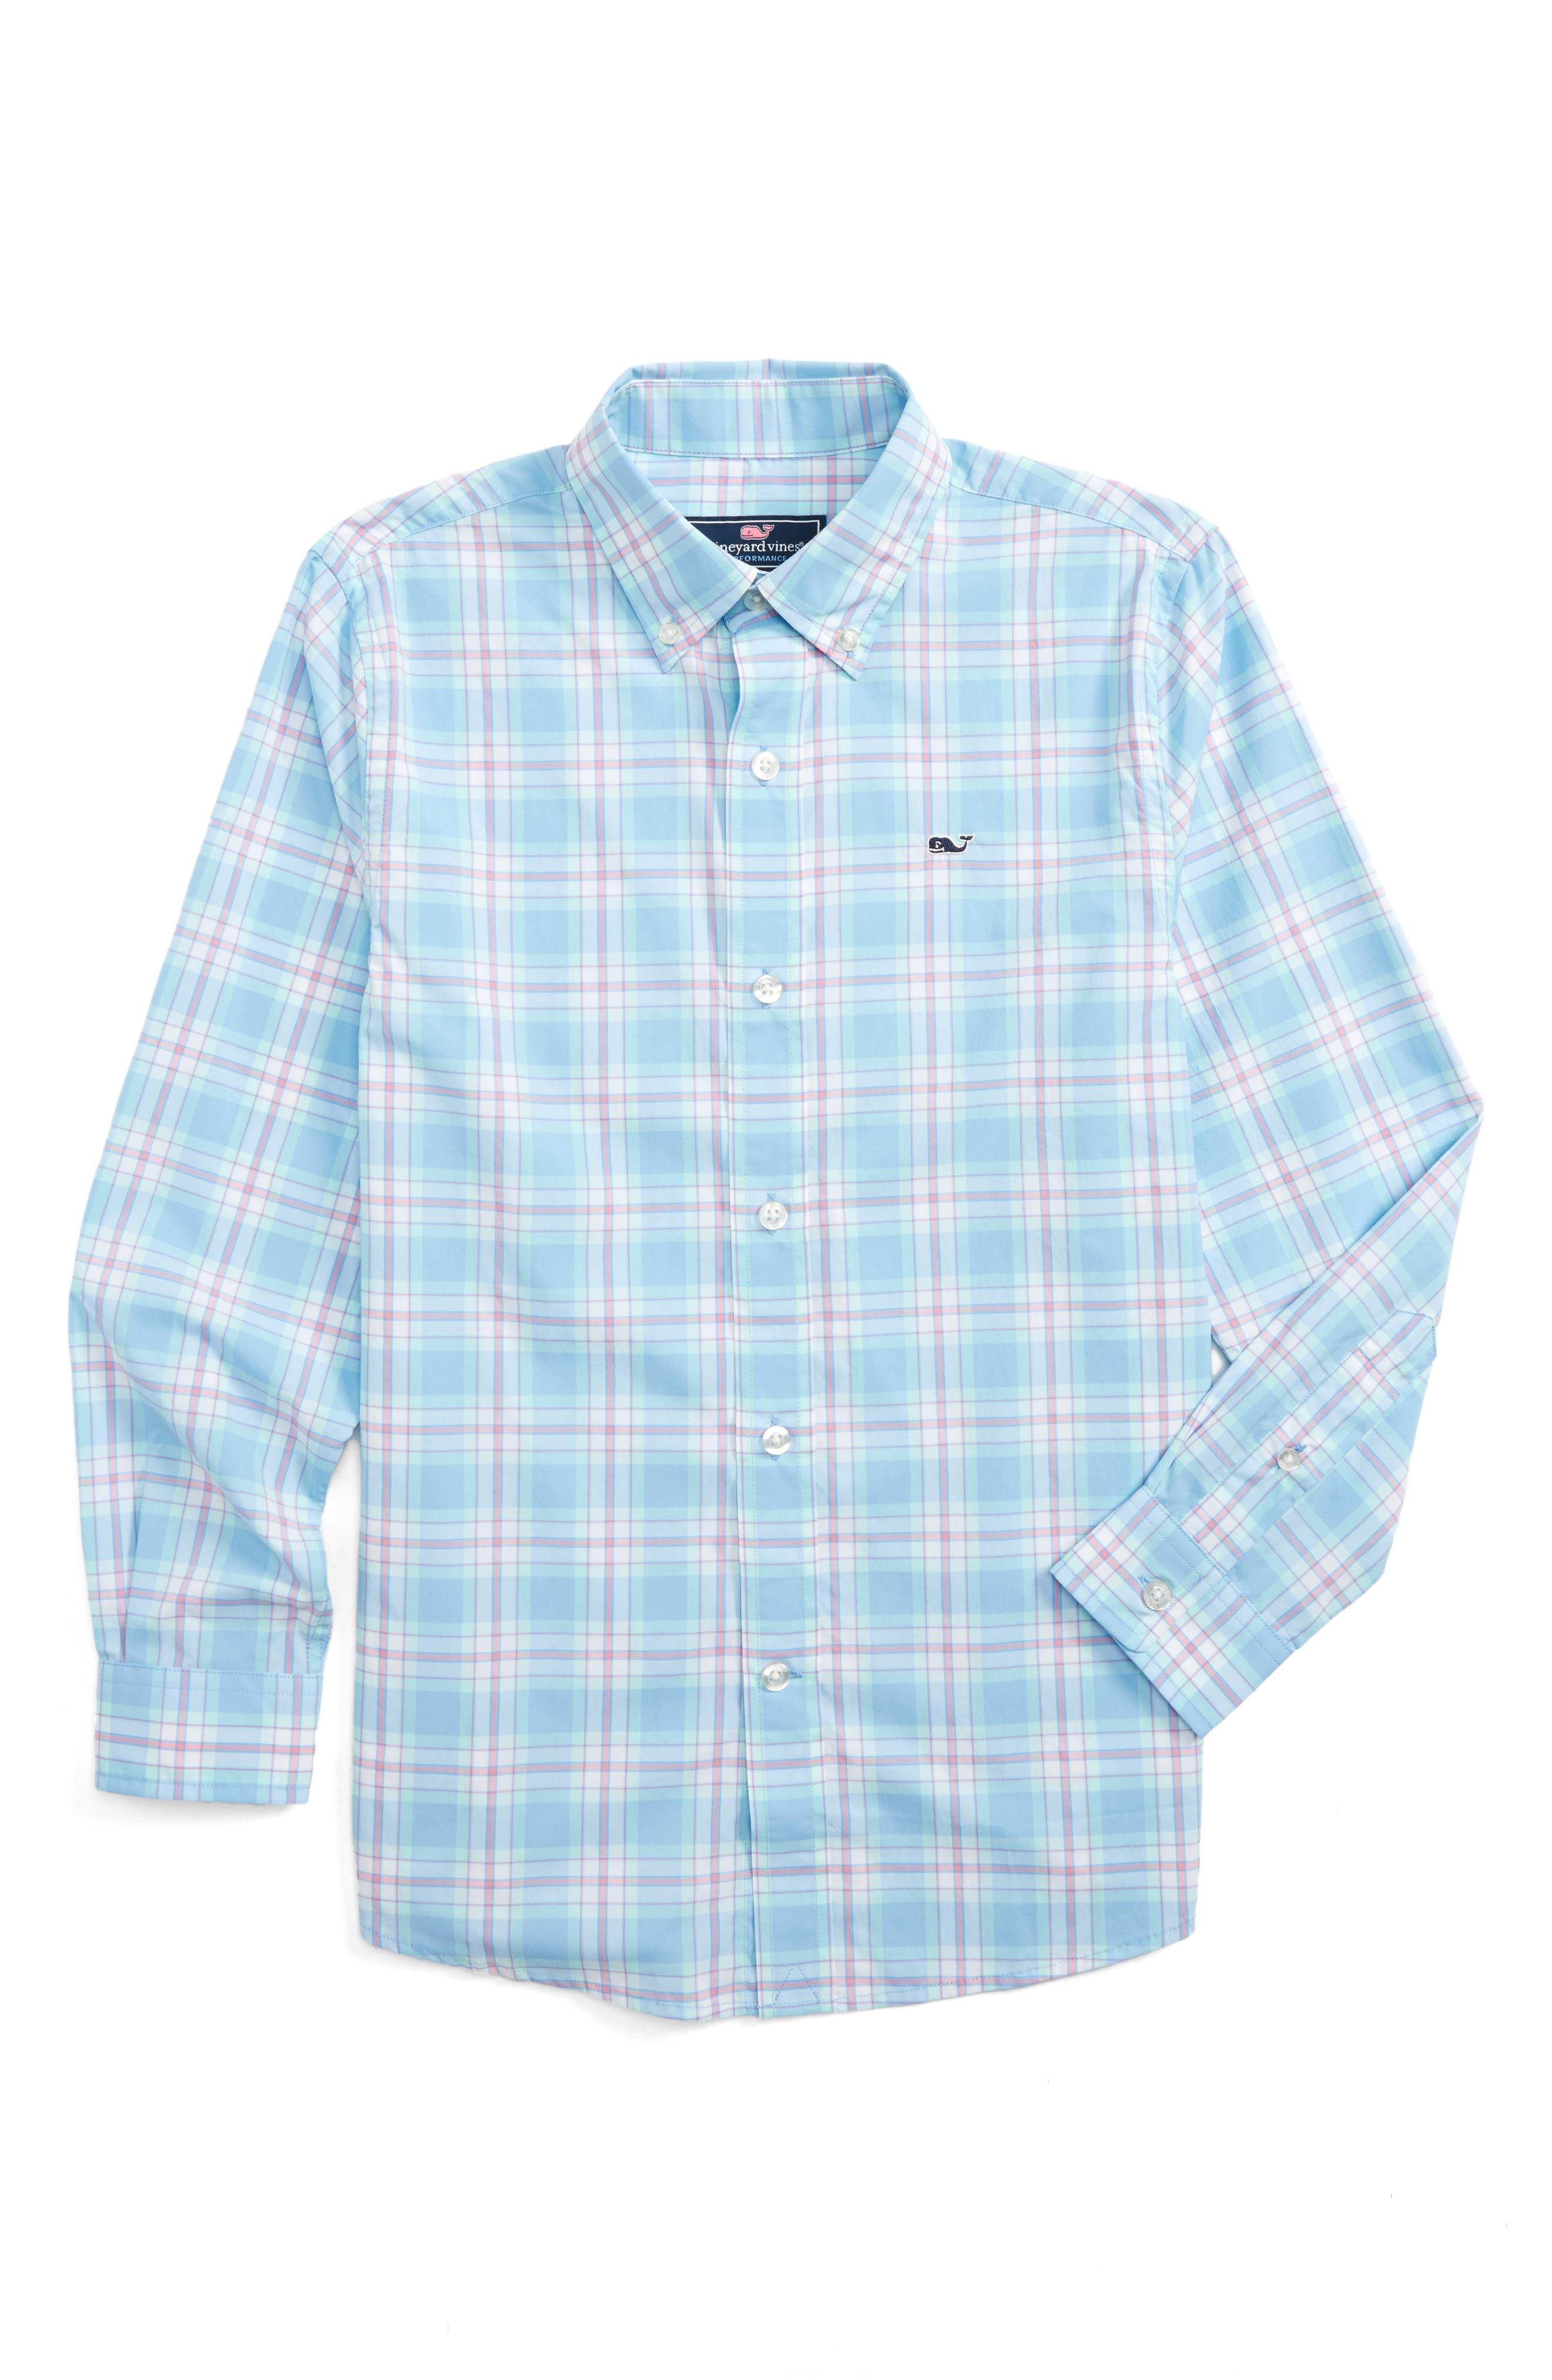 Montauk Point Performance Whale Shirt,                         Main,                         color,